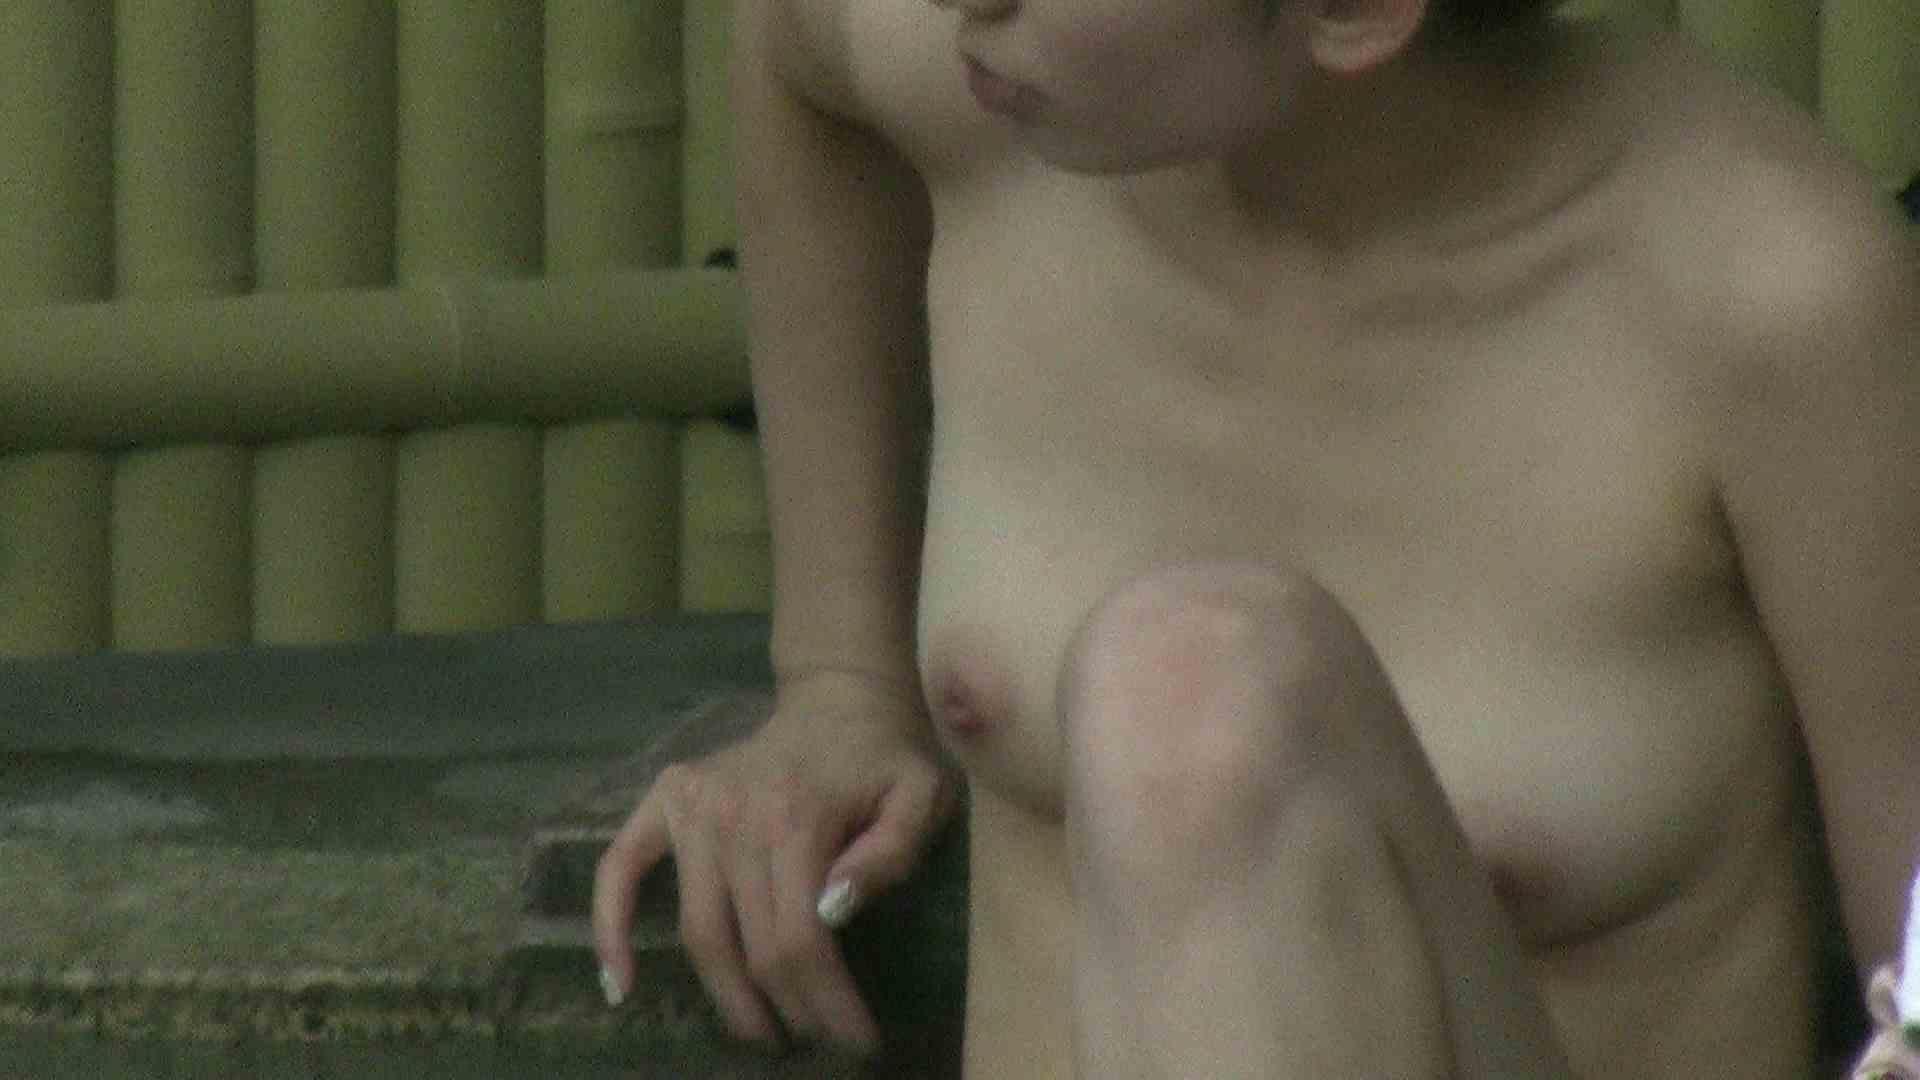 Aquaな露天風呂Vol.208 盗撮 隠し撮りオマンコ動画紹介 85画像 14